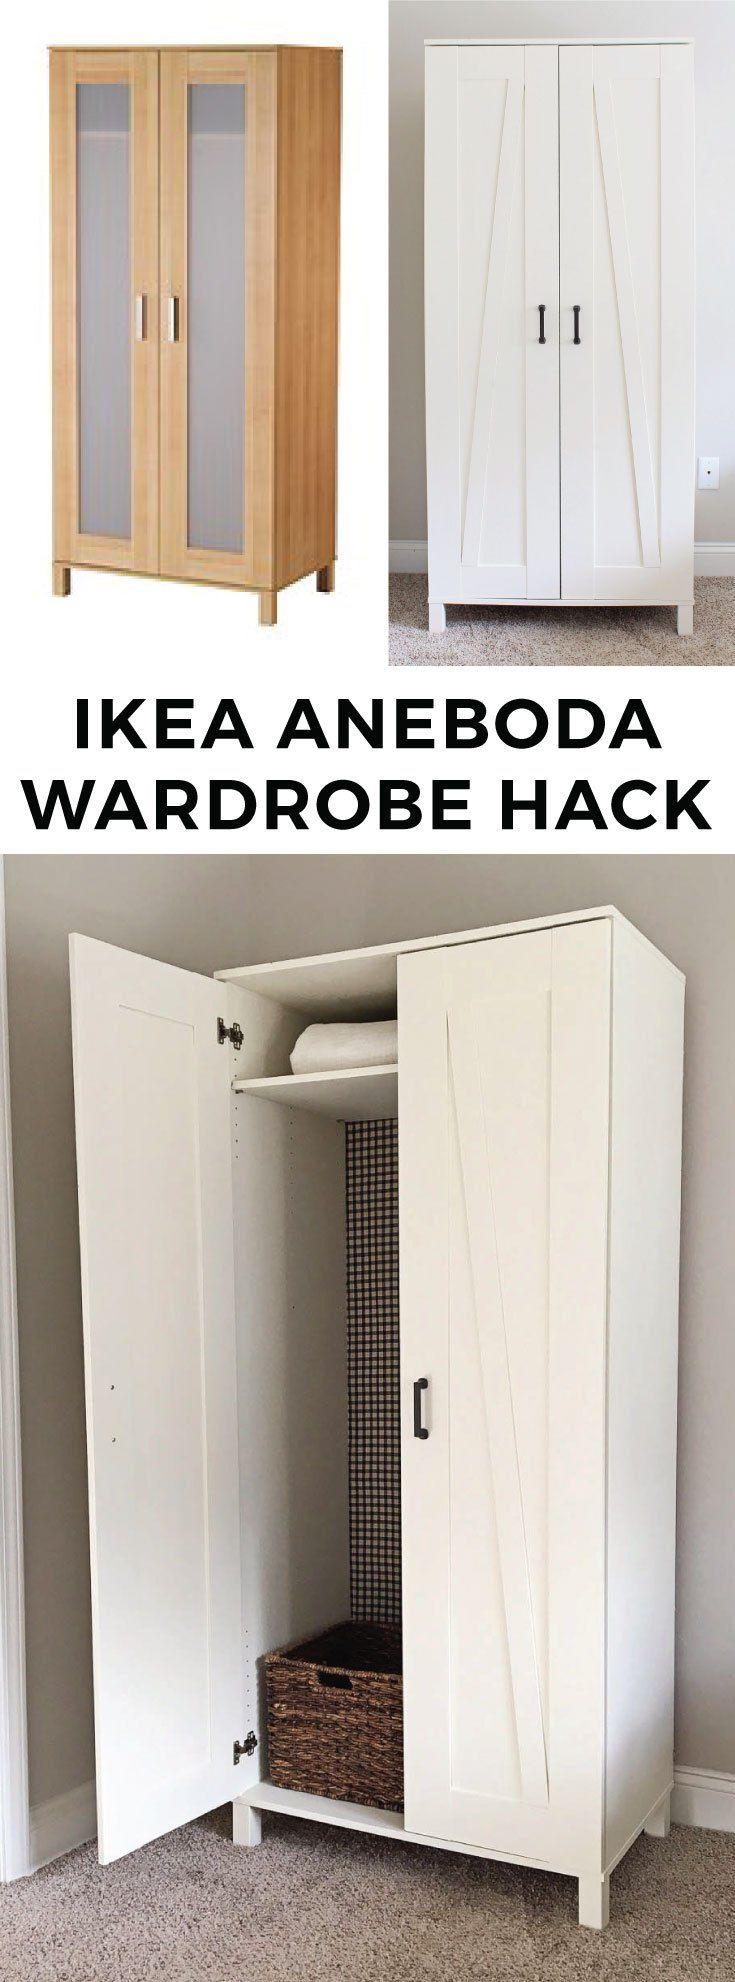 IKEA Hack - Aneboda Wardrobe